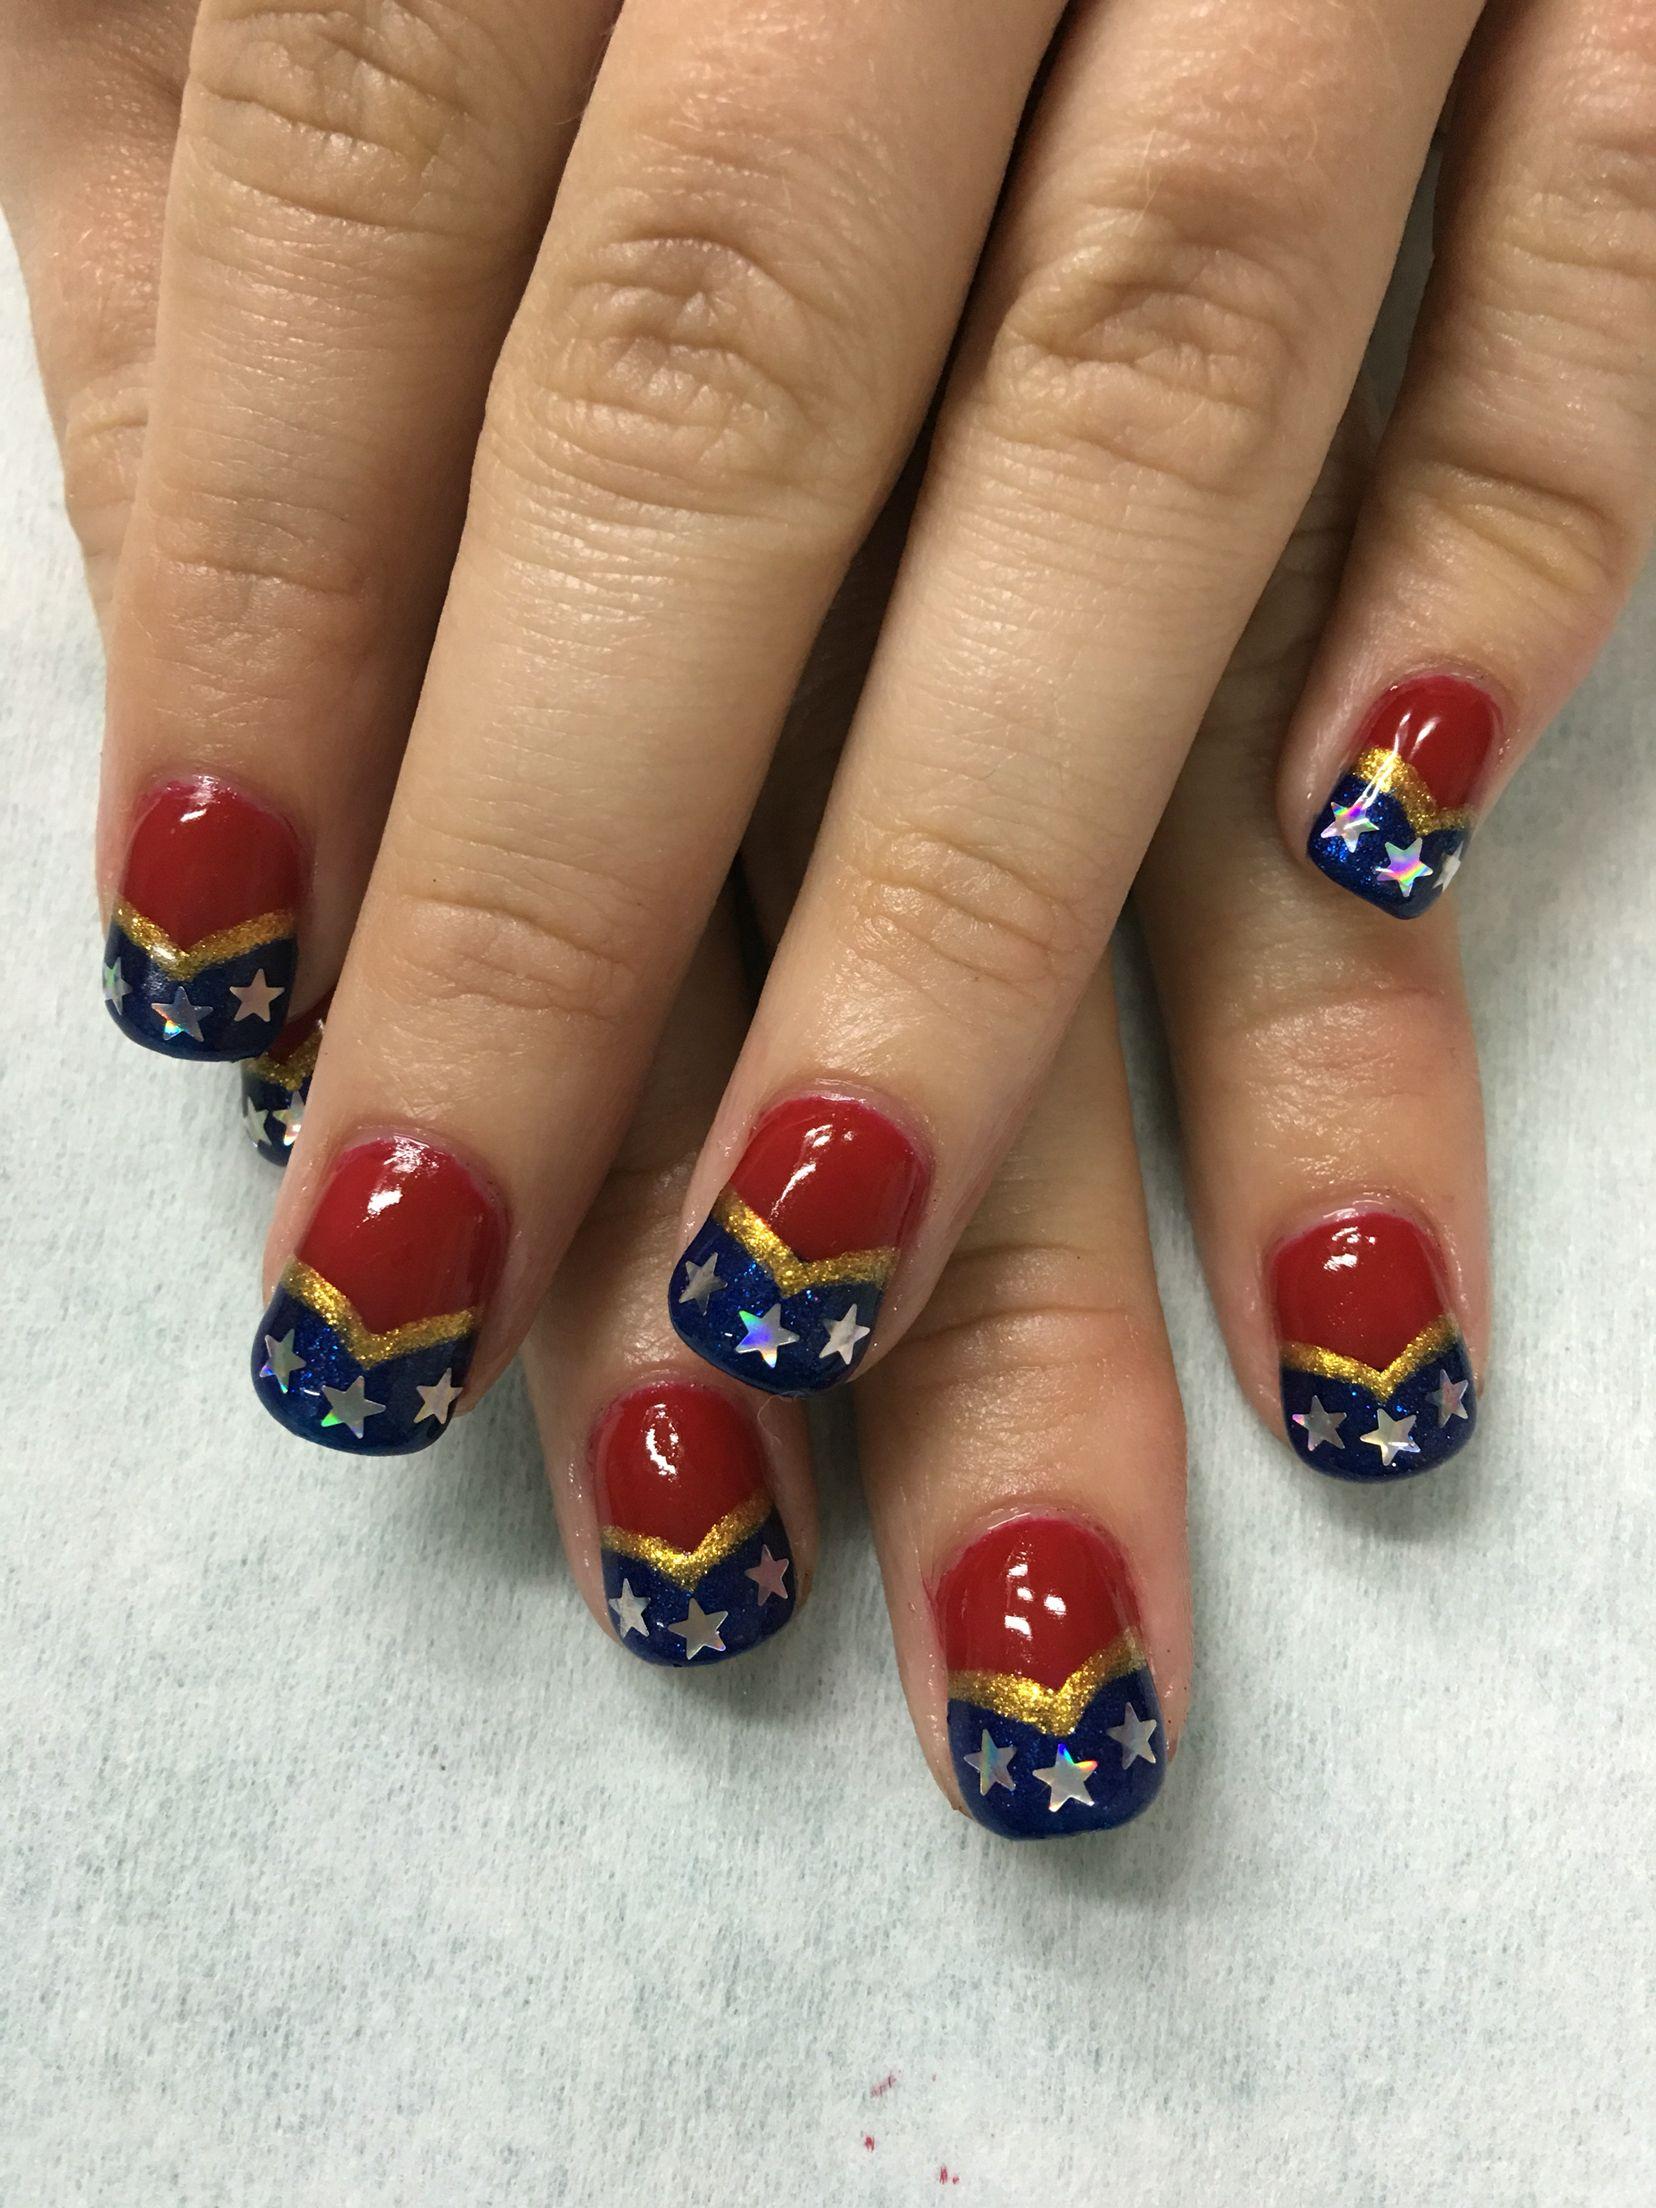 Wonder Woman gel nails | Gel Nail designs | Pinterest | Wonder Woman ...